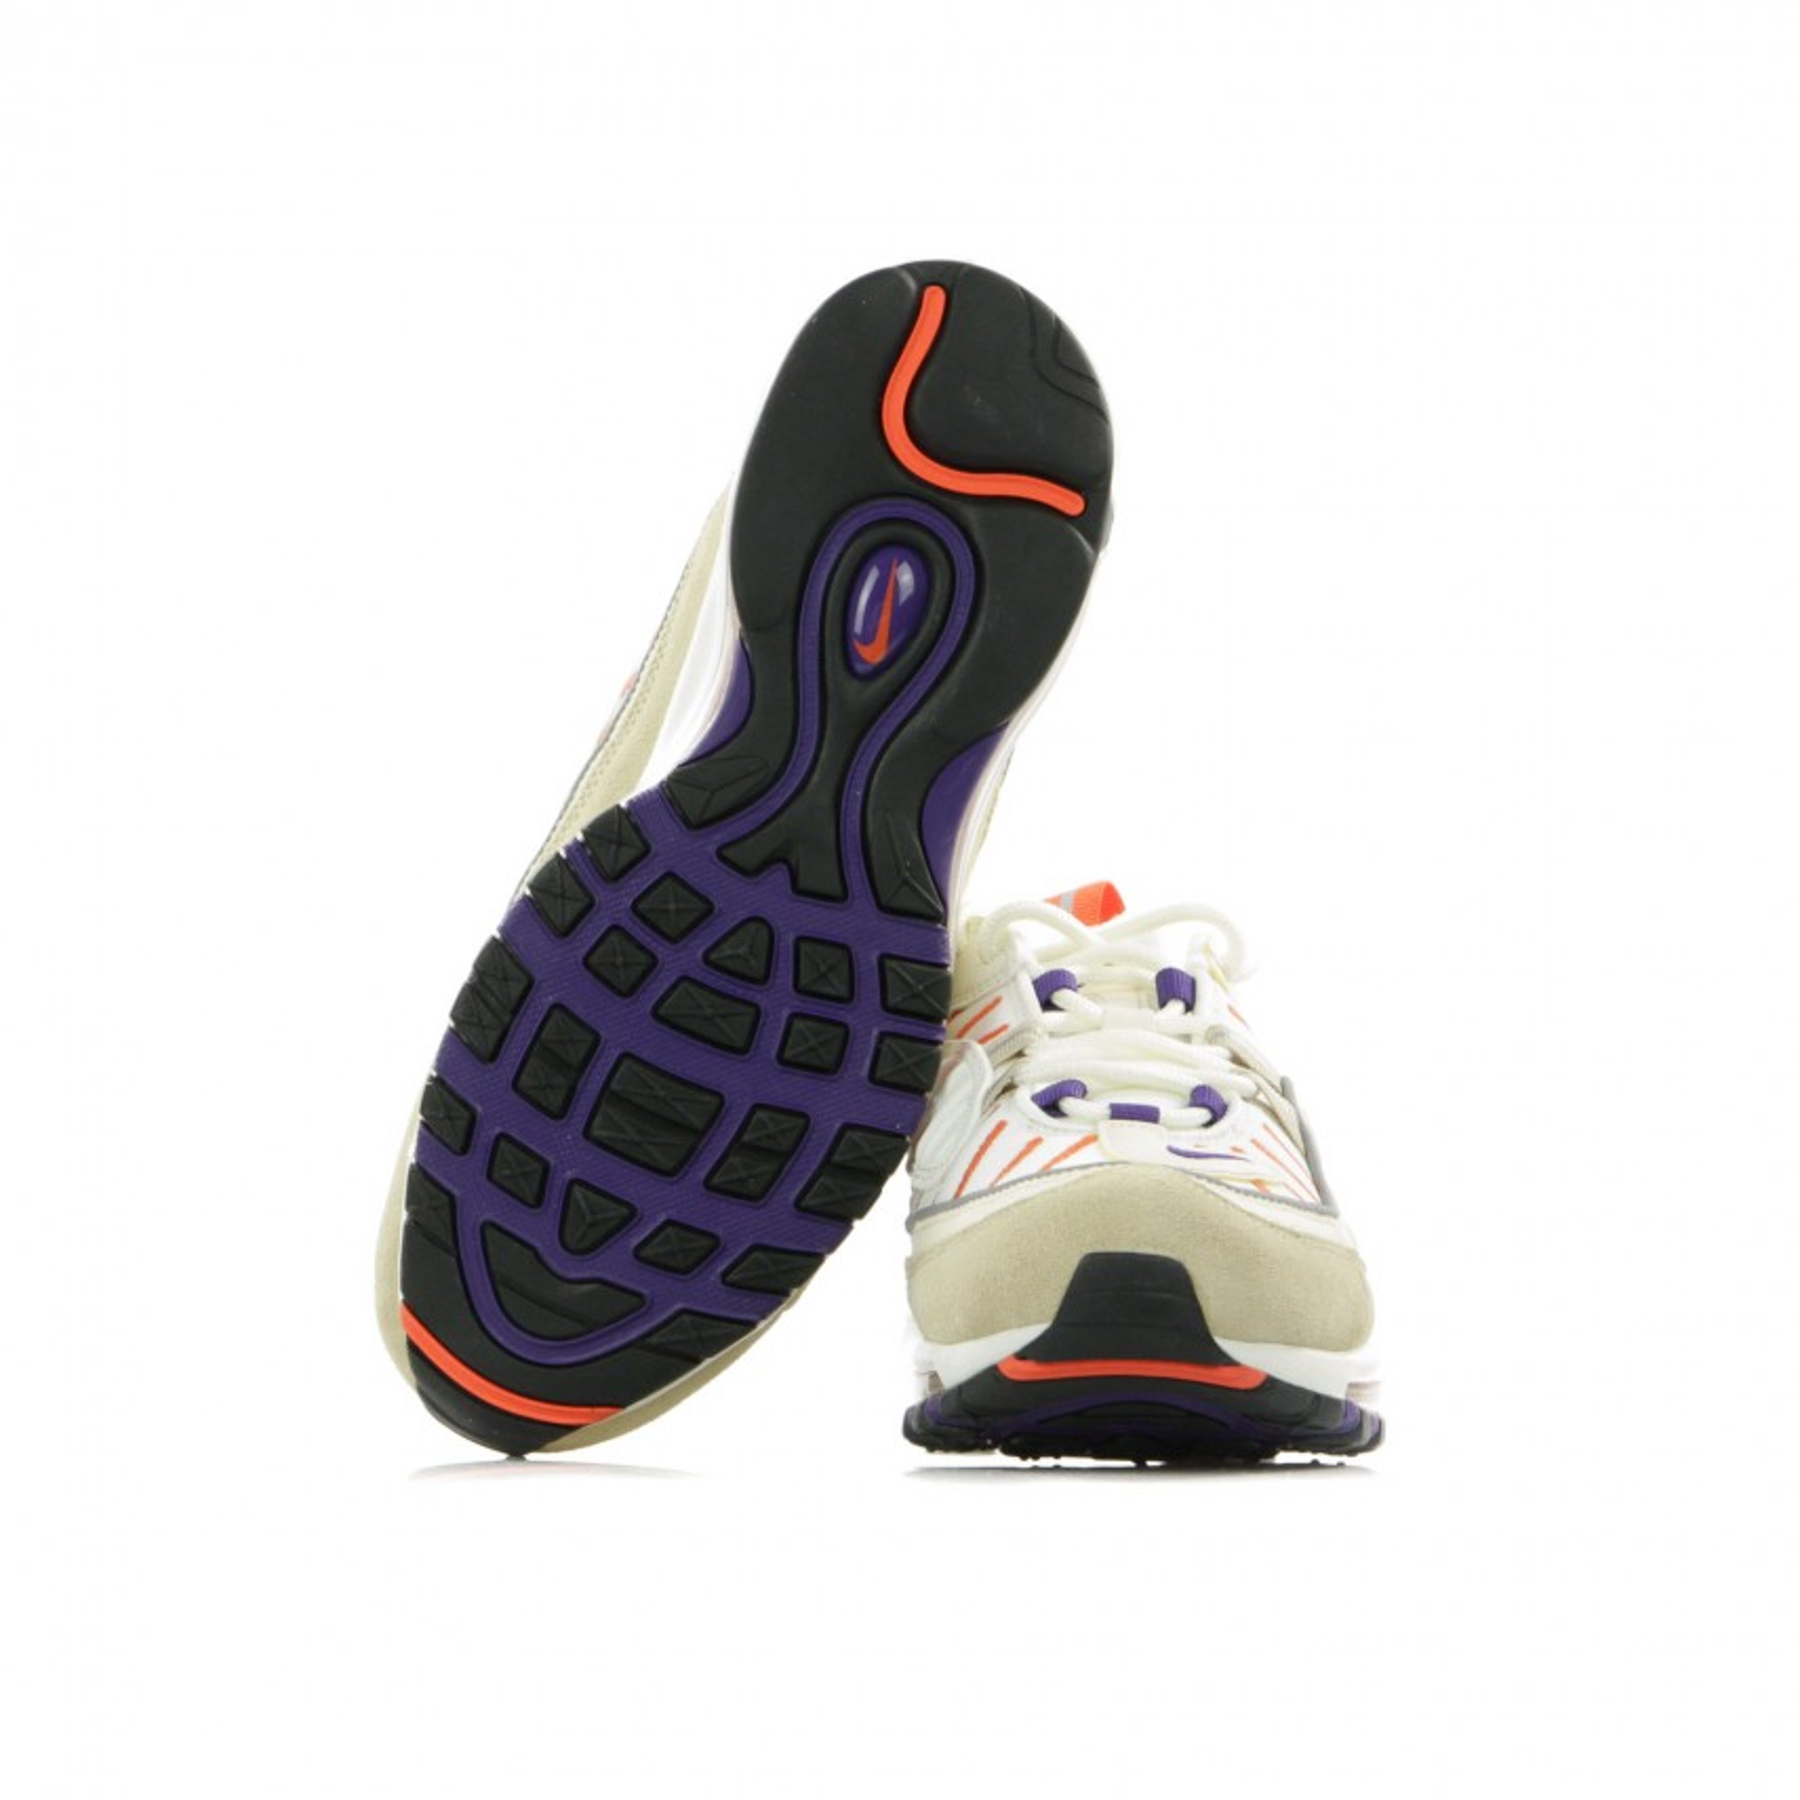 Nike Air Max 98 Sail Court Purple light Cream desert Ore in